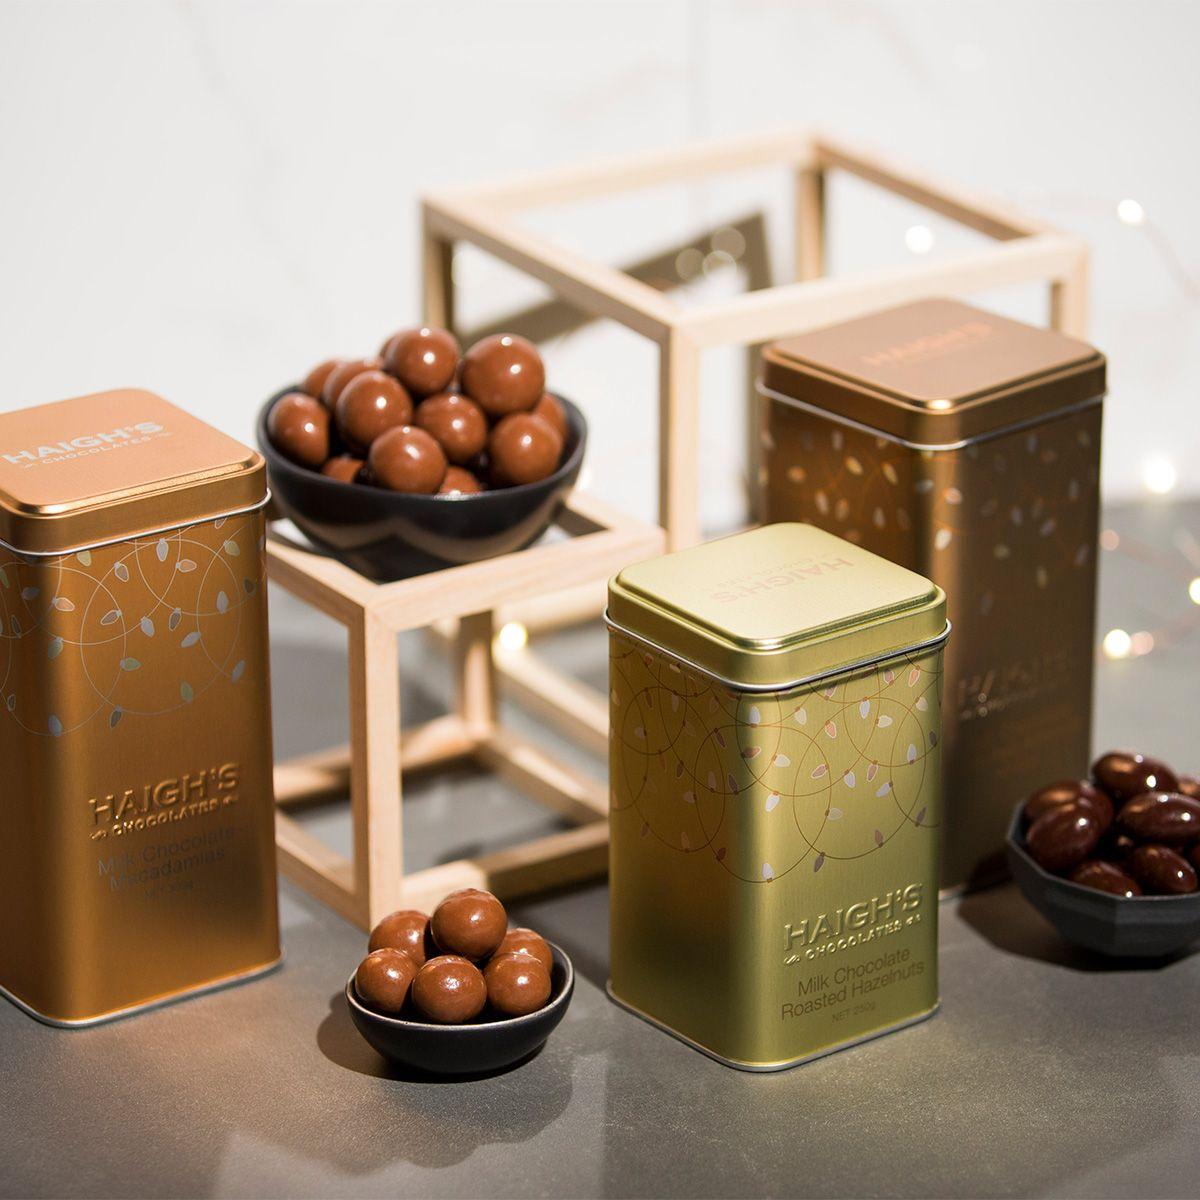 Haighs chocolates christmas 2016 beautiful impressive